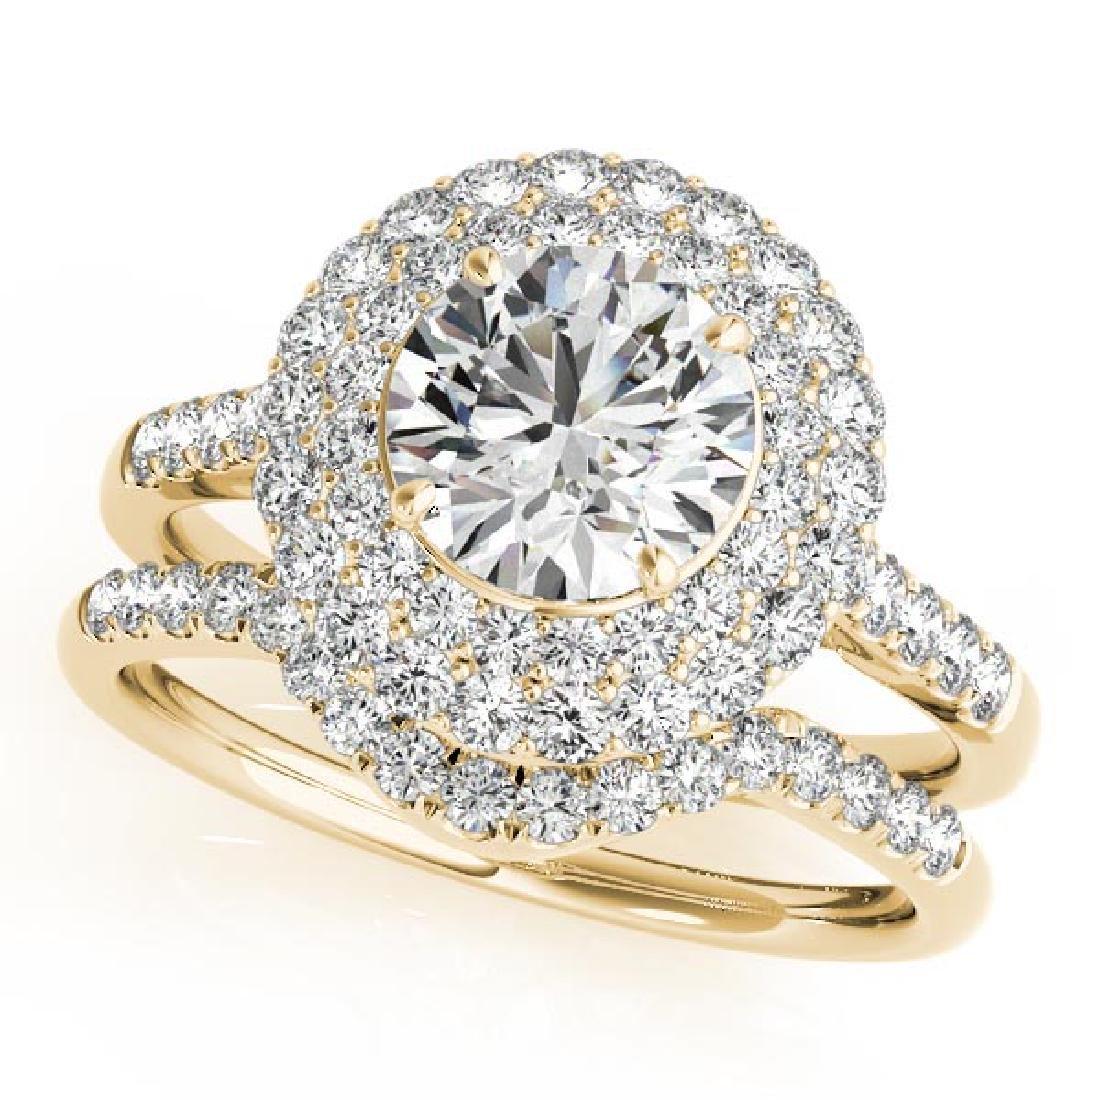 CERTIFIED 14KT WHITE GOLD 1.24 CT G-H/VS-SI1 DIAMOND HA